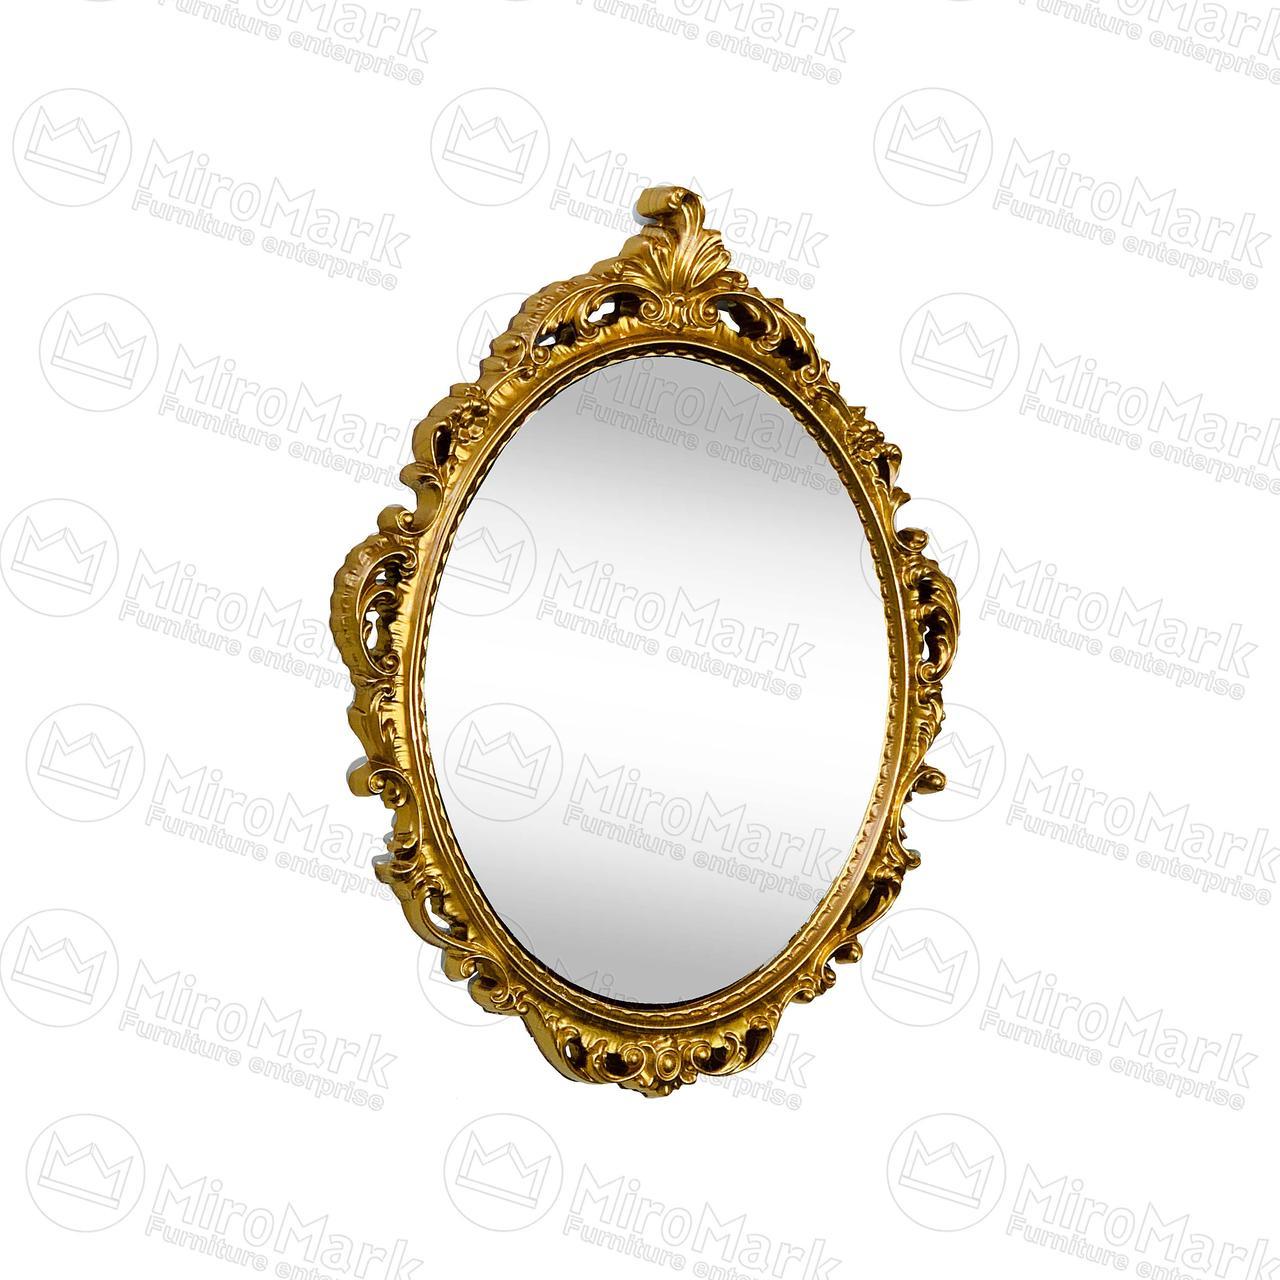 Дзеркало, золото